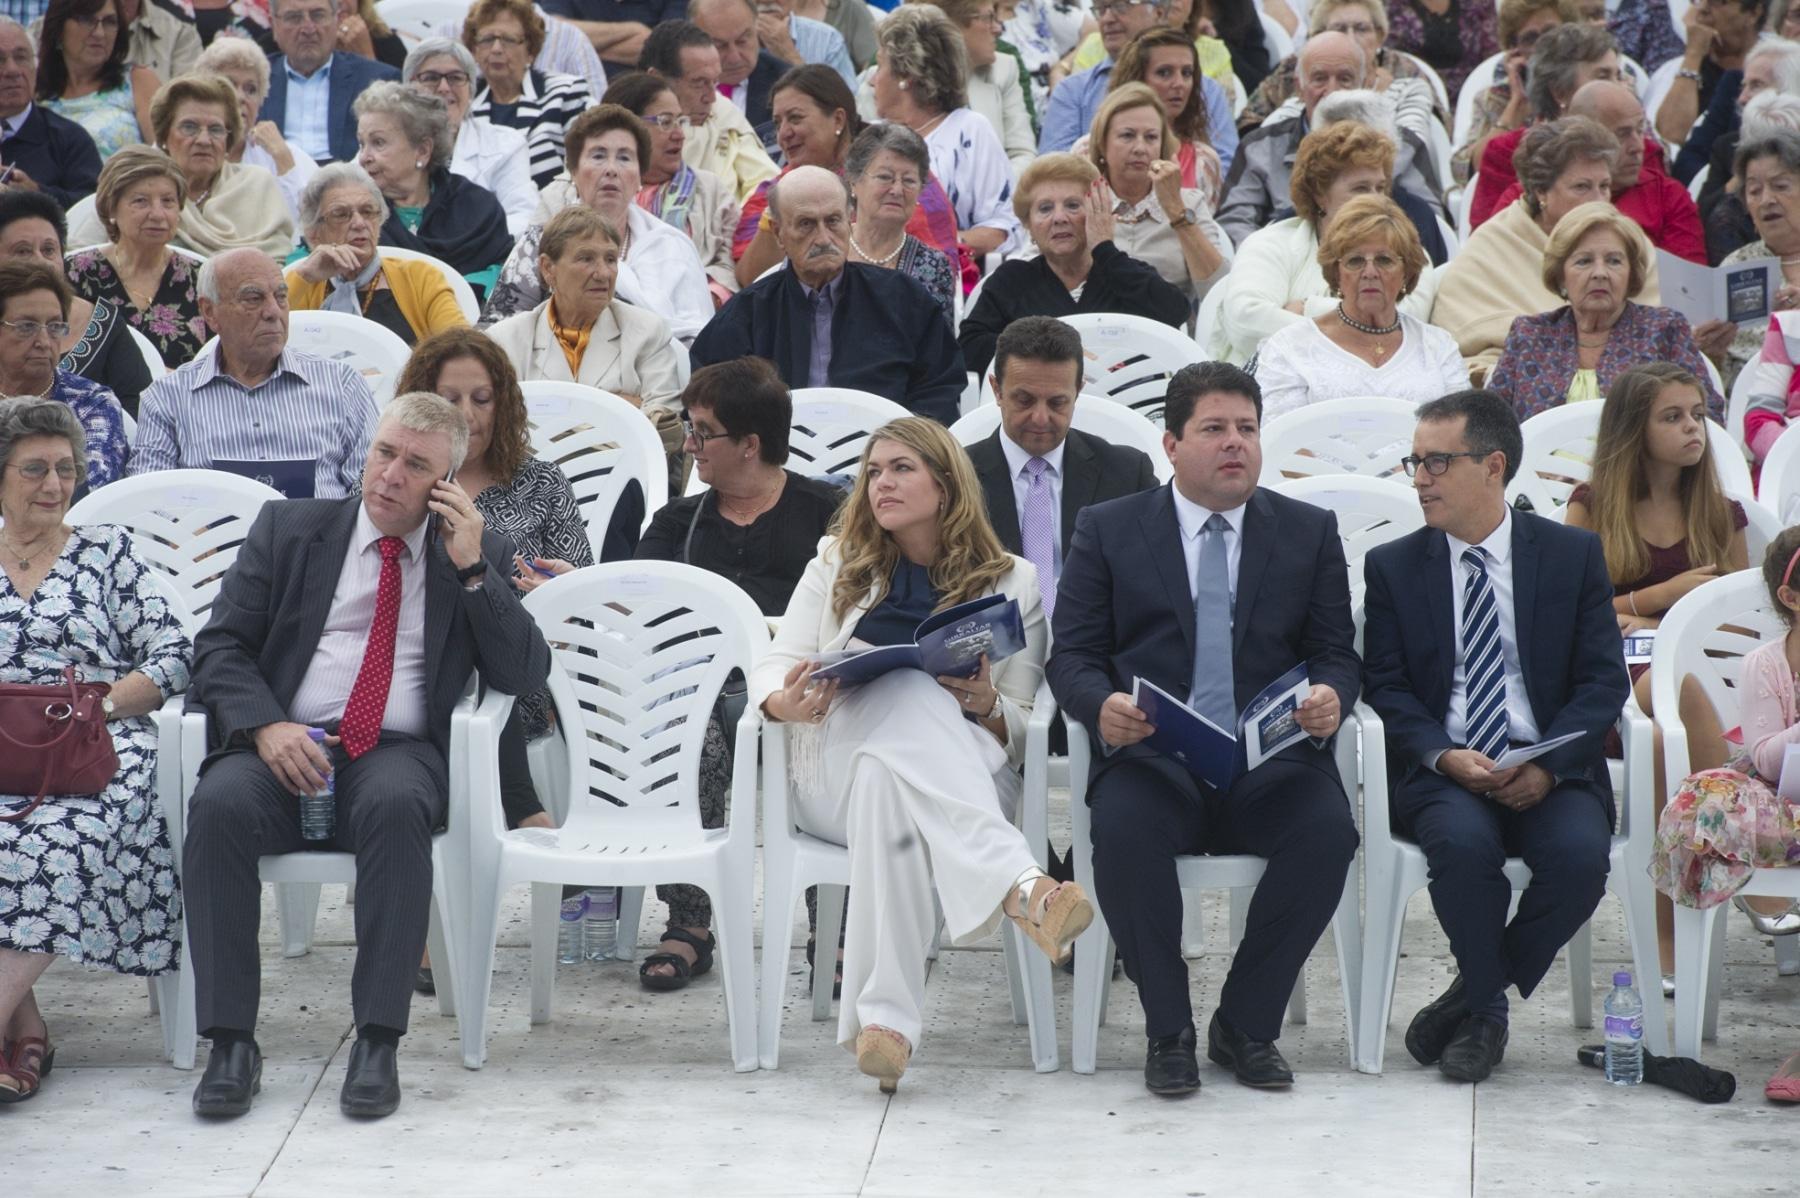 concierto-evacuados-de-gibraltar-07092015-23bn_21052076599_o